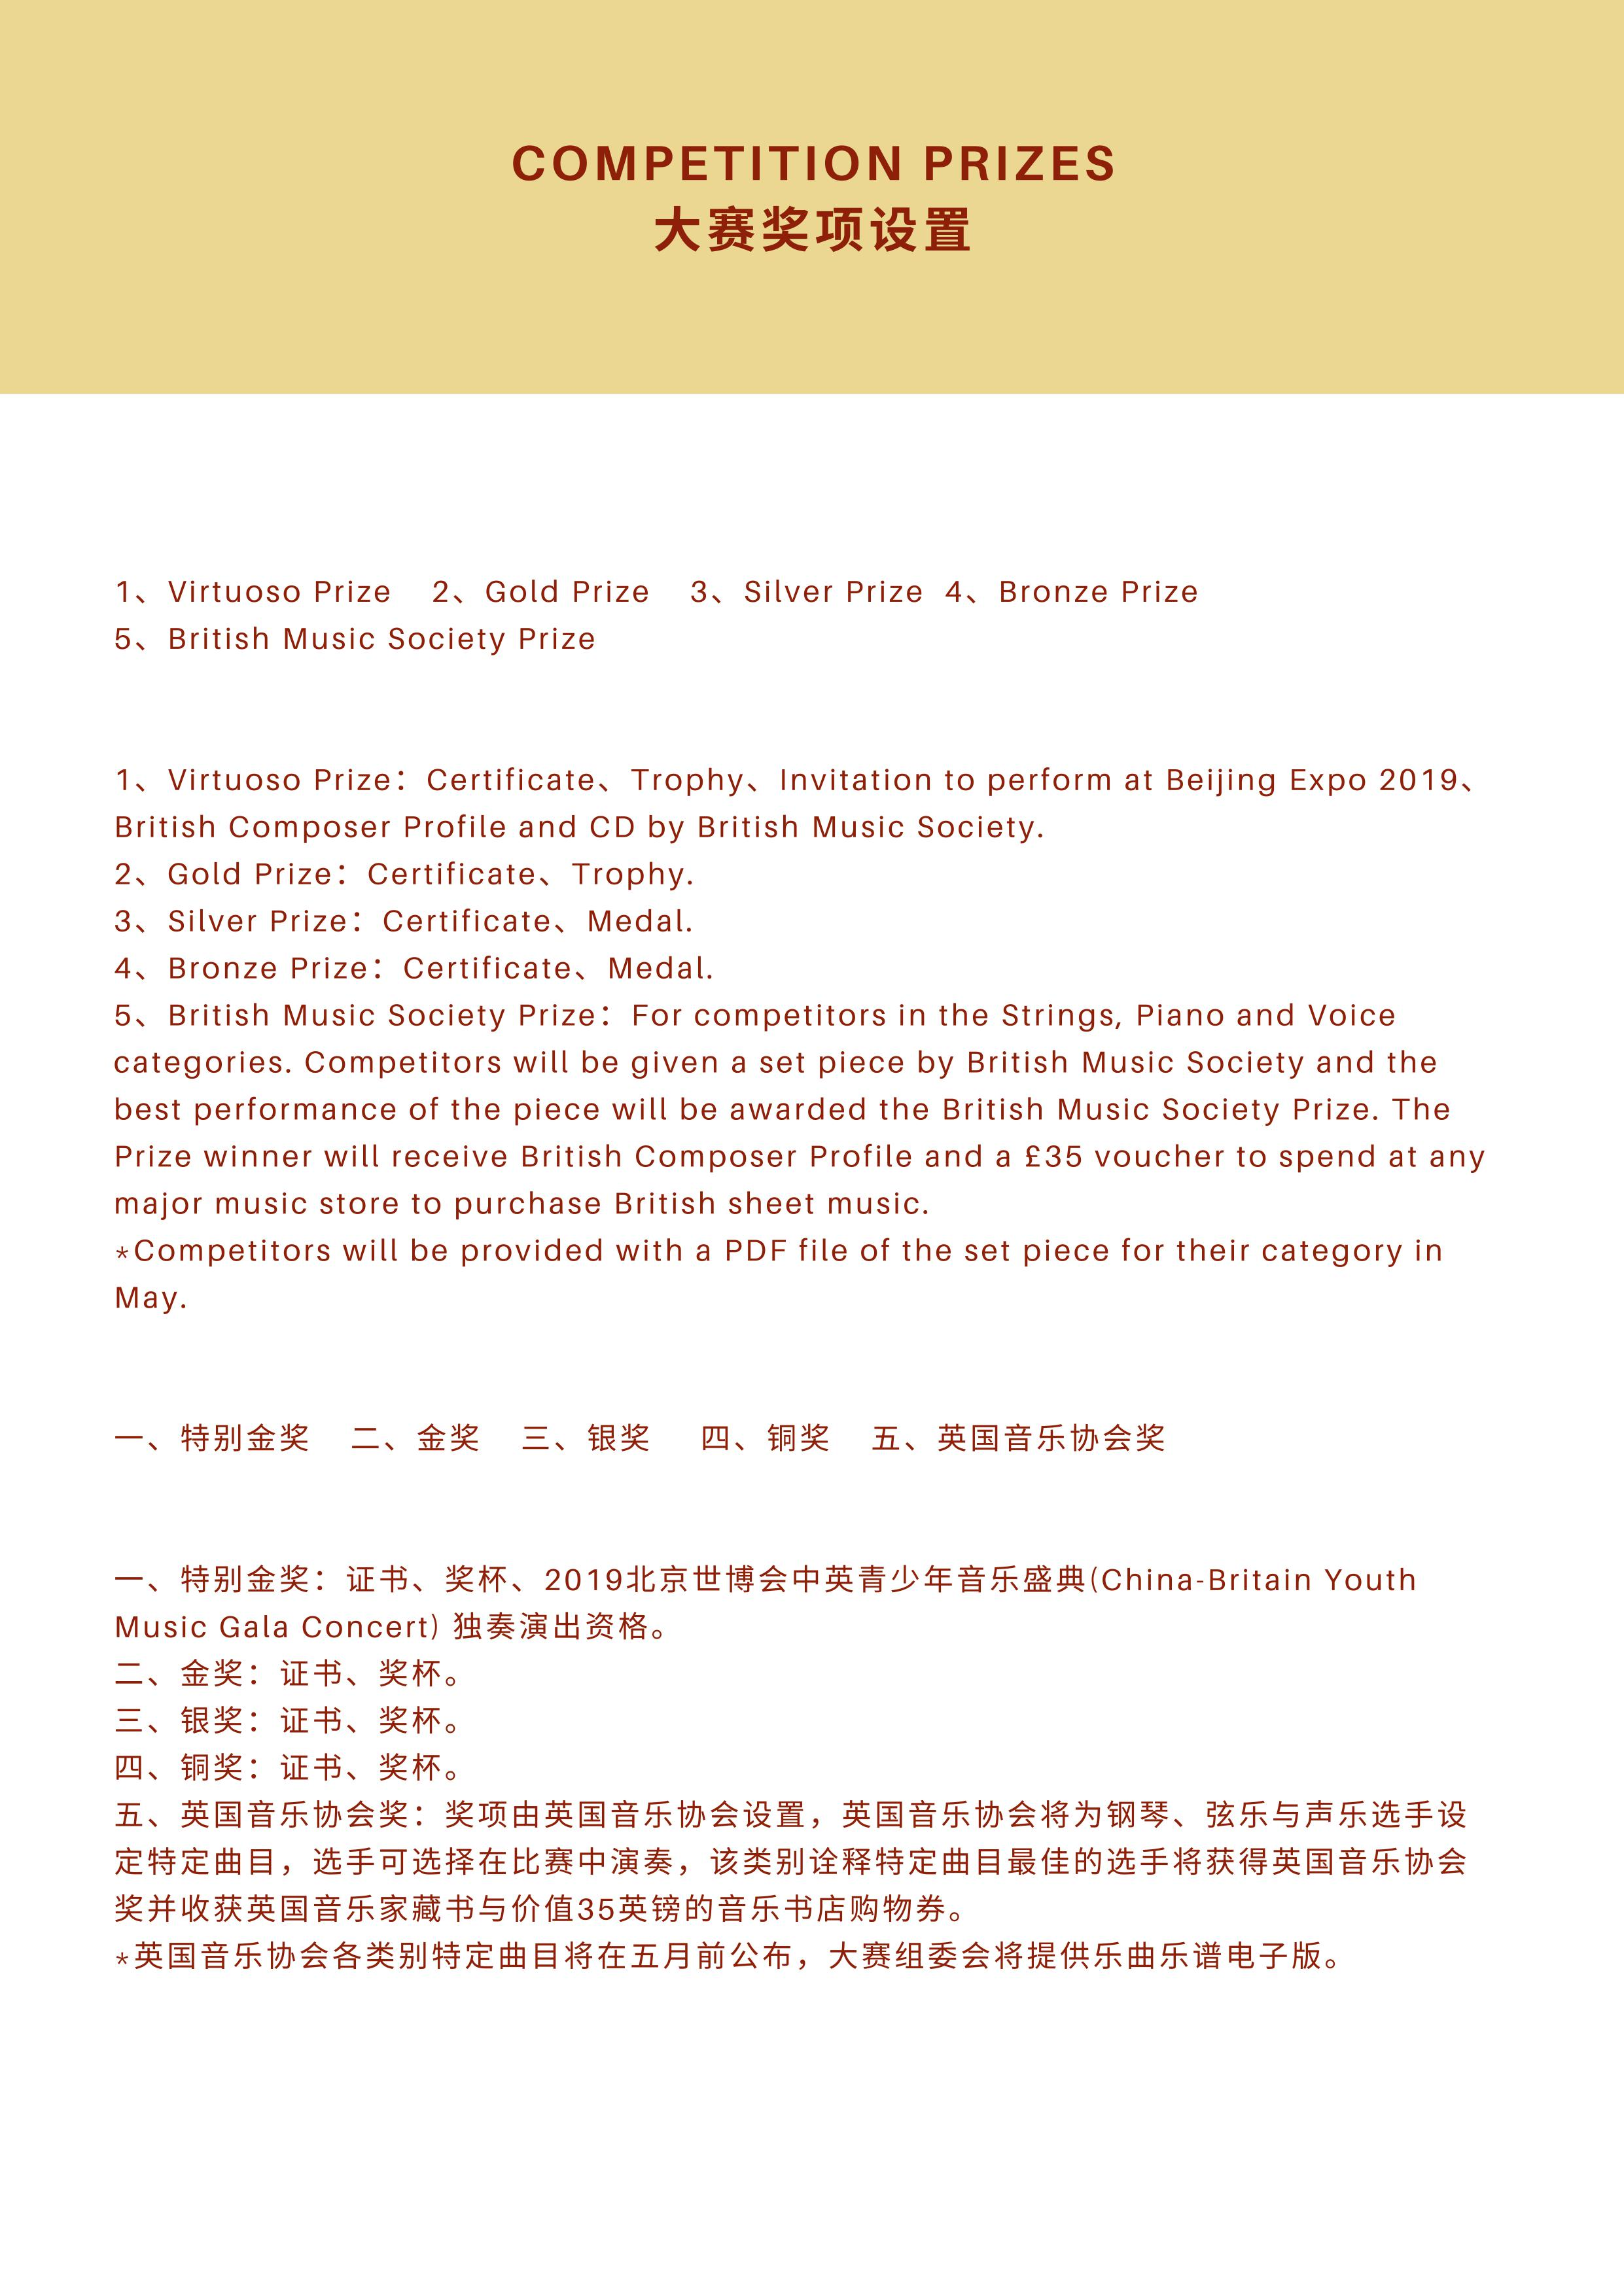 Amy Yuan Academy 2019 Brochure11.jpg